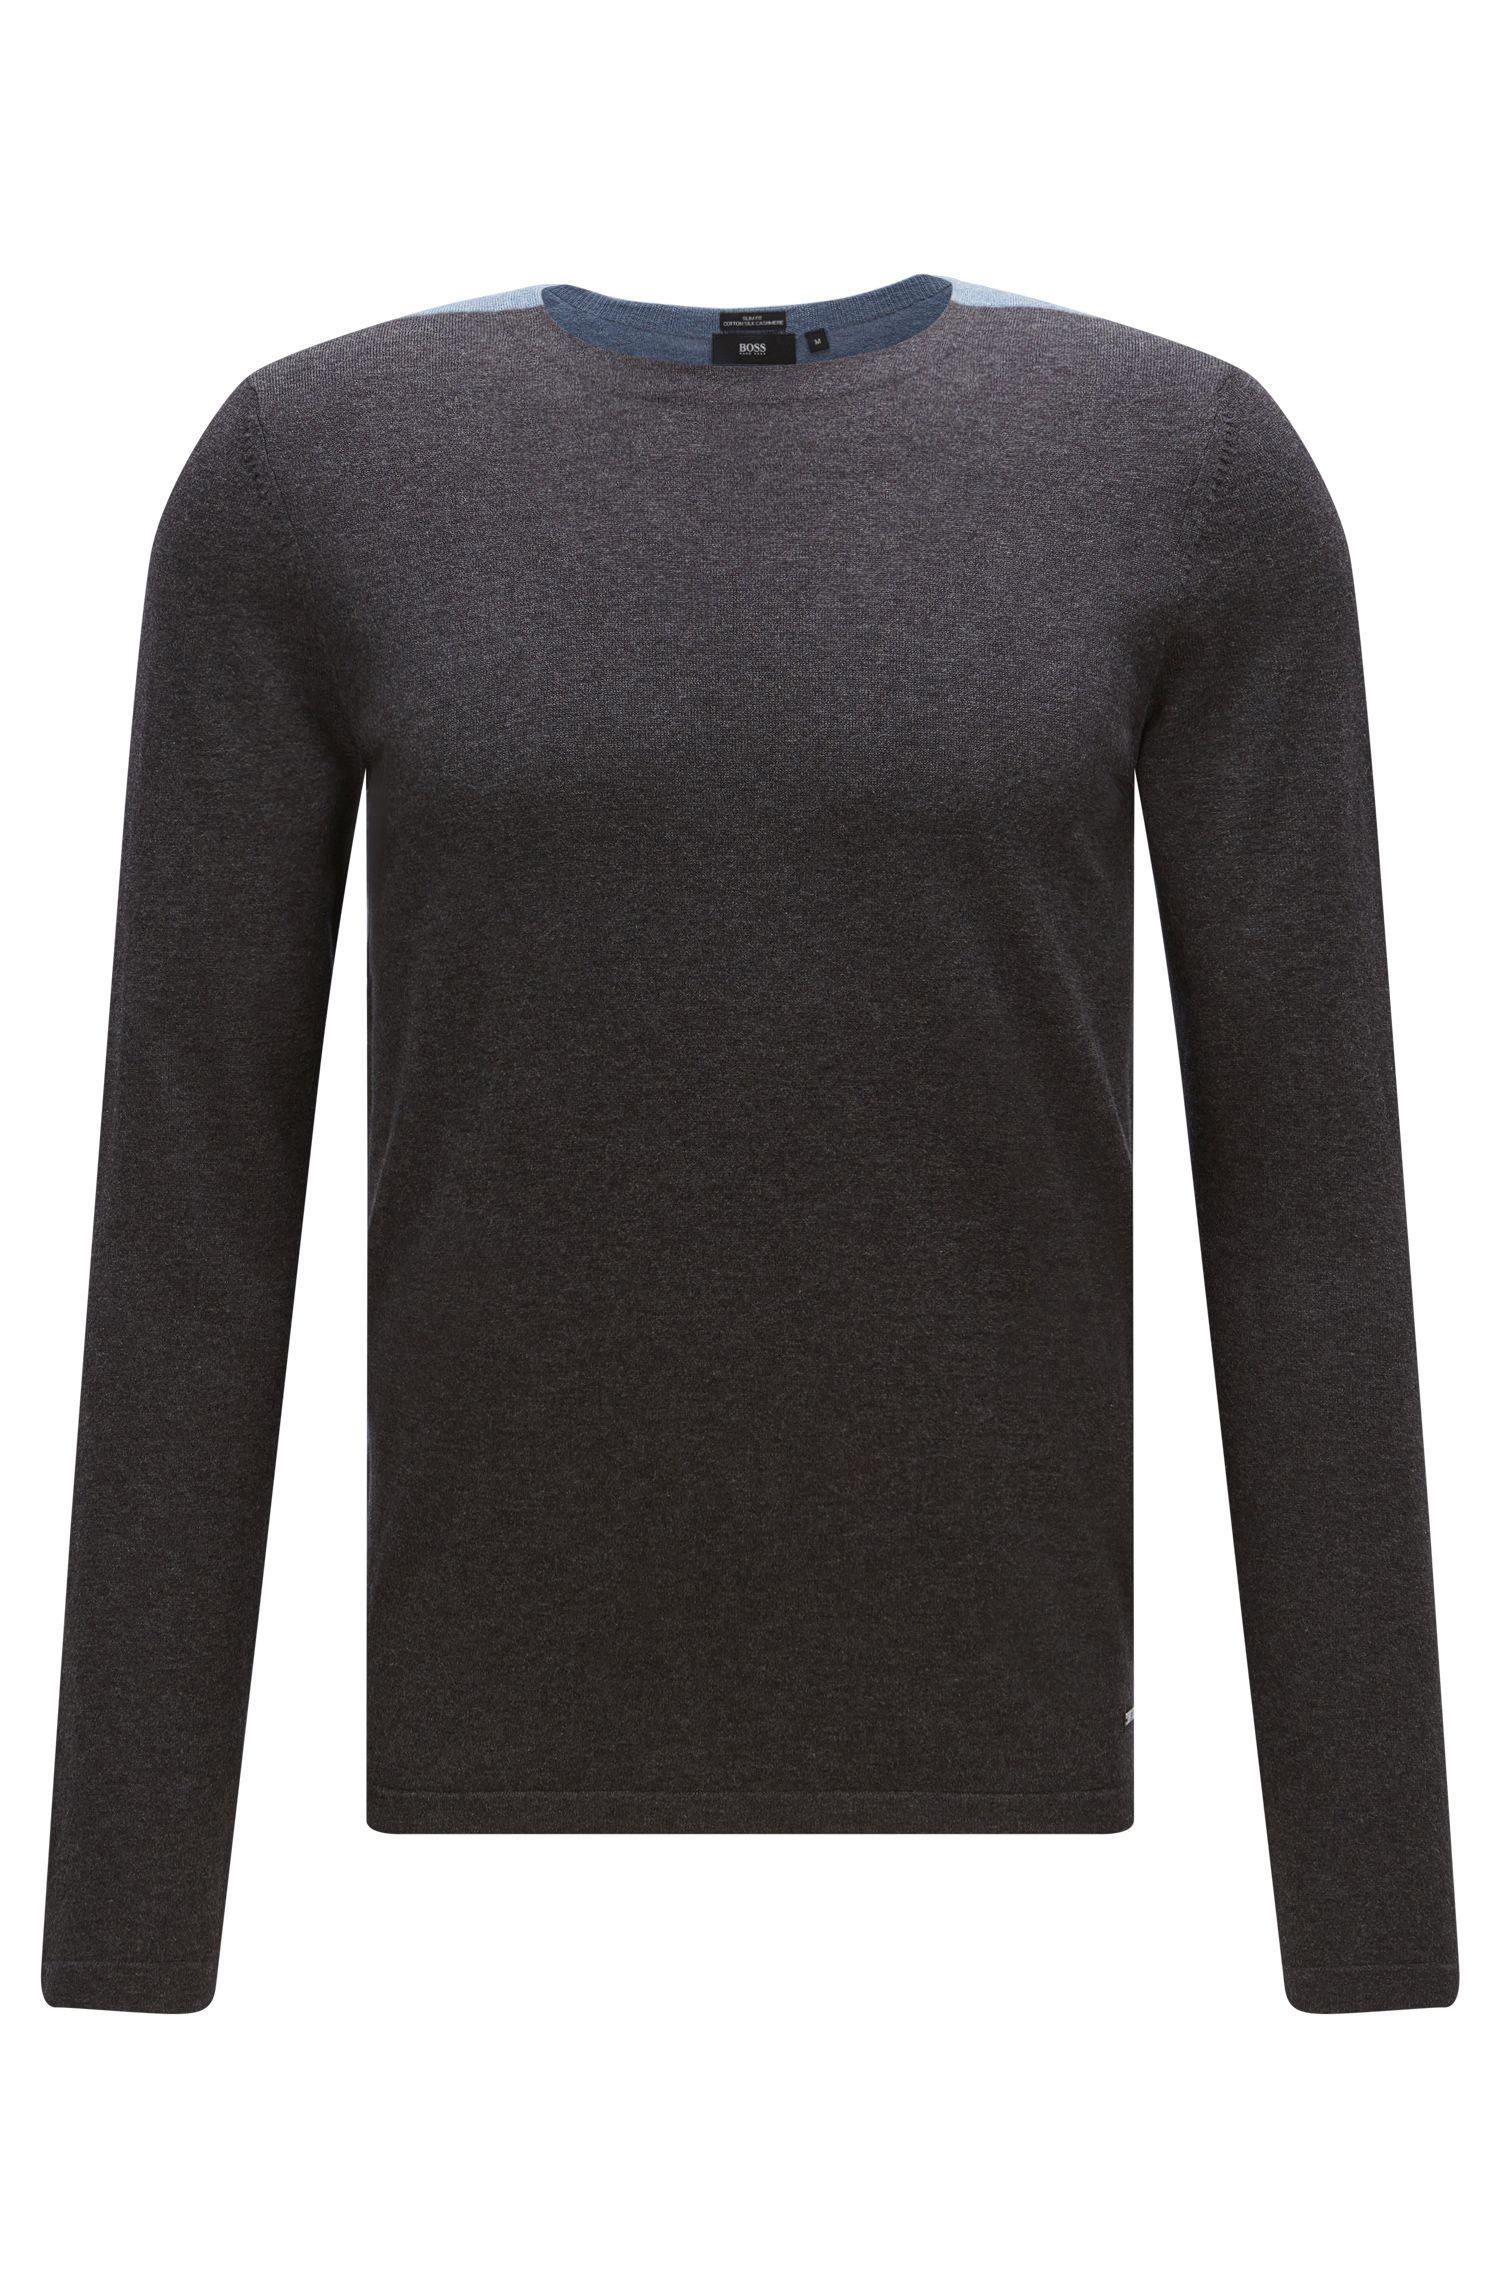 'Onzo' | Cotton Silk Cashmere Colorblocked Sweater